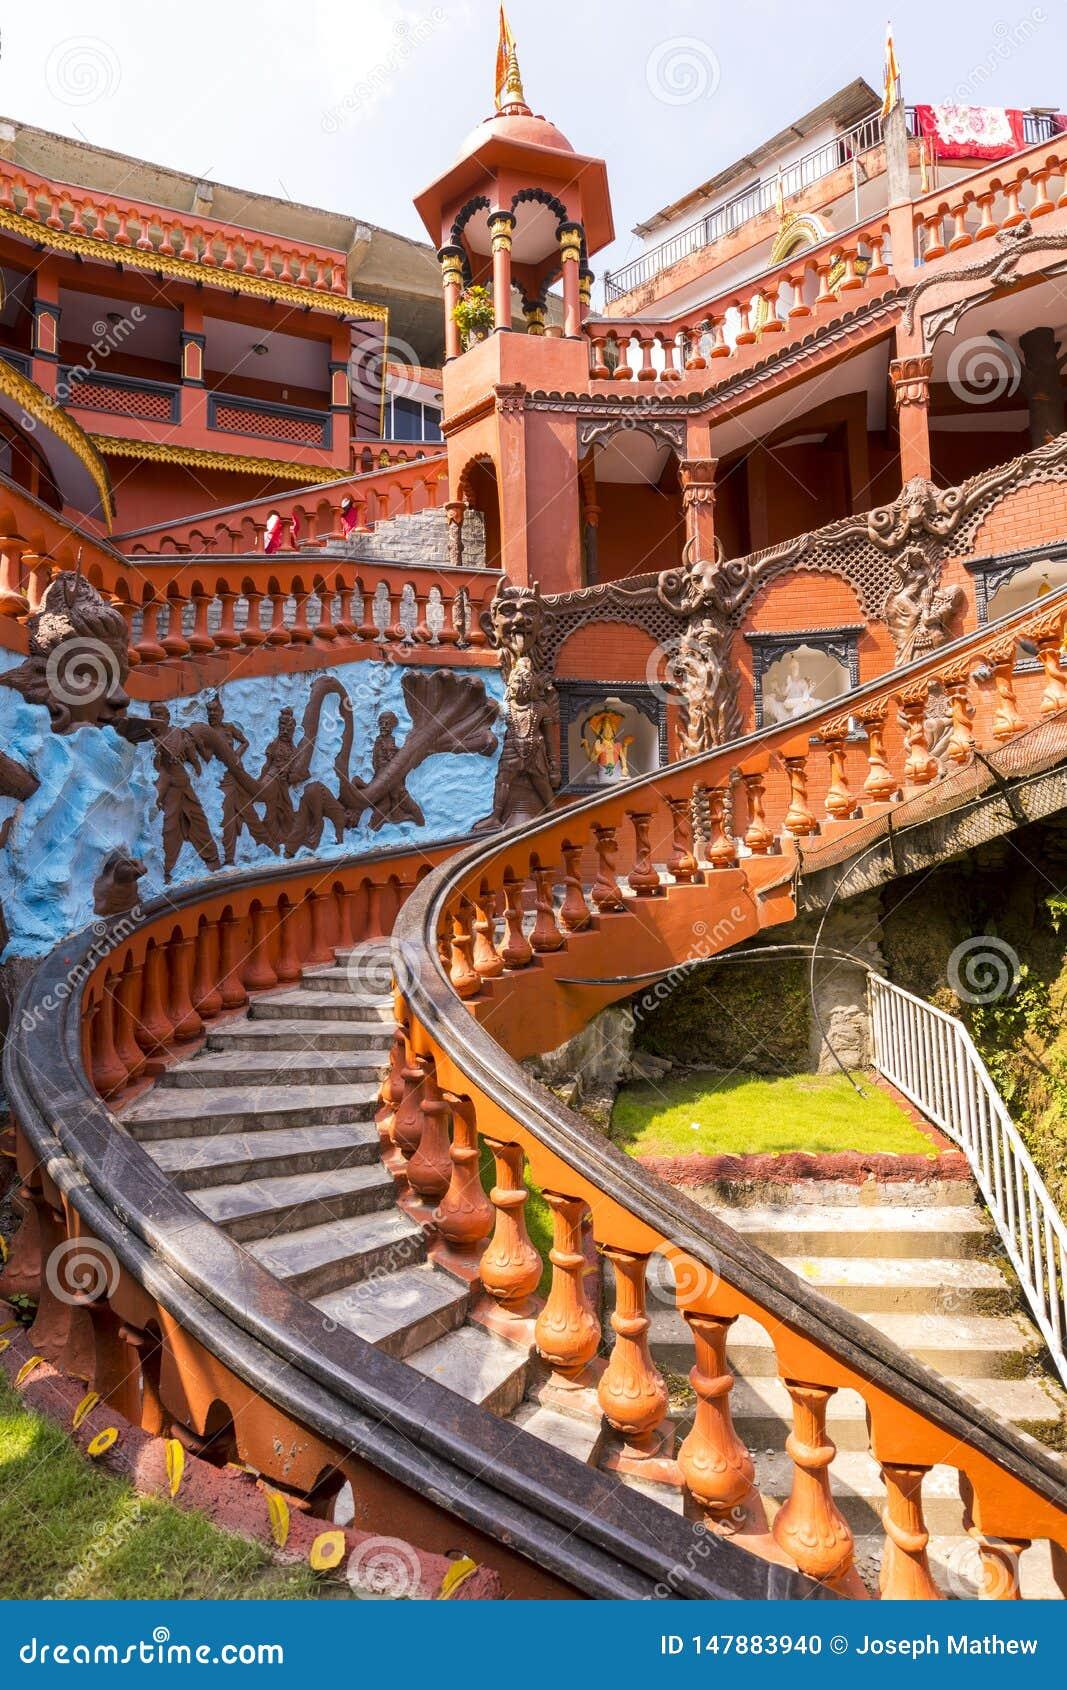 Eingangs-Gebäude von Höhle Pokhara Nepal Gupteshwar Mahadev